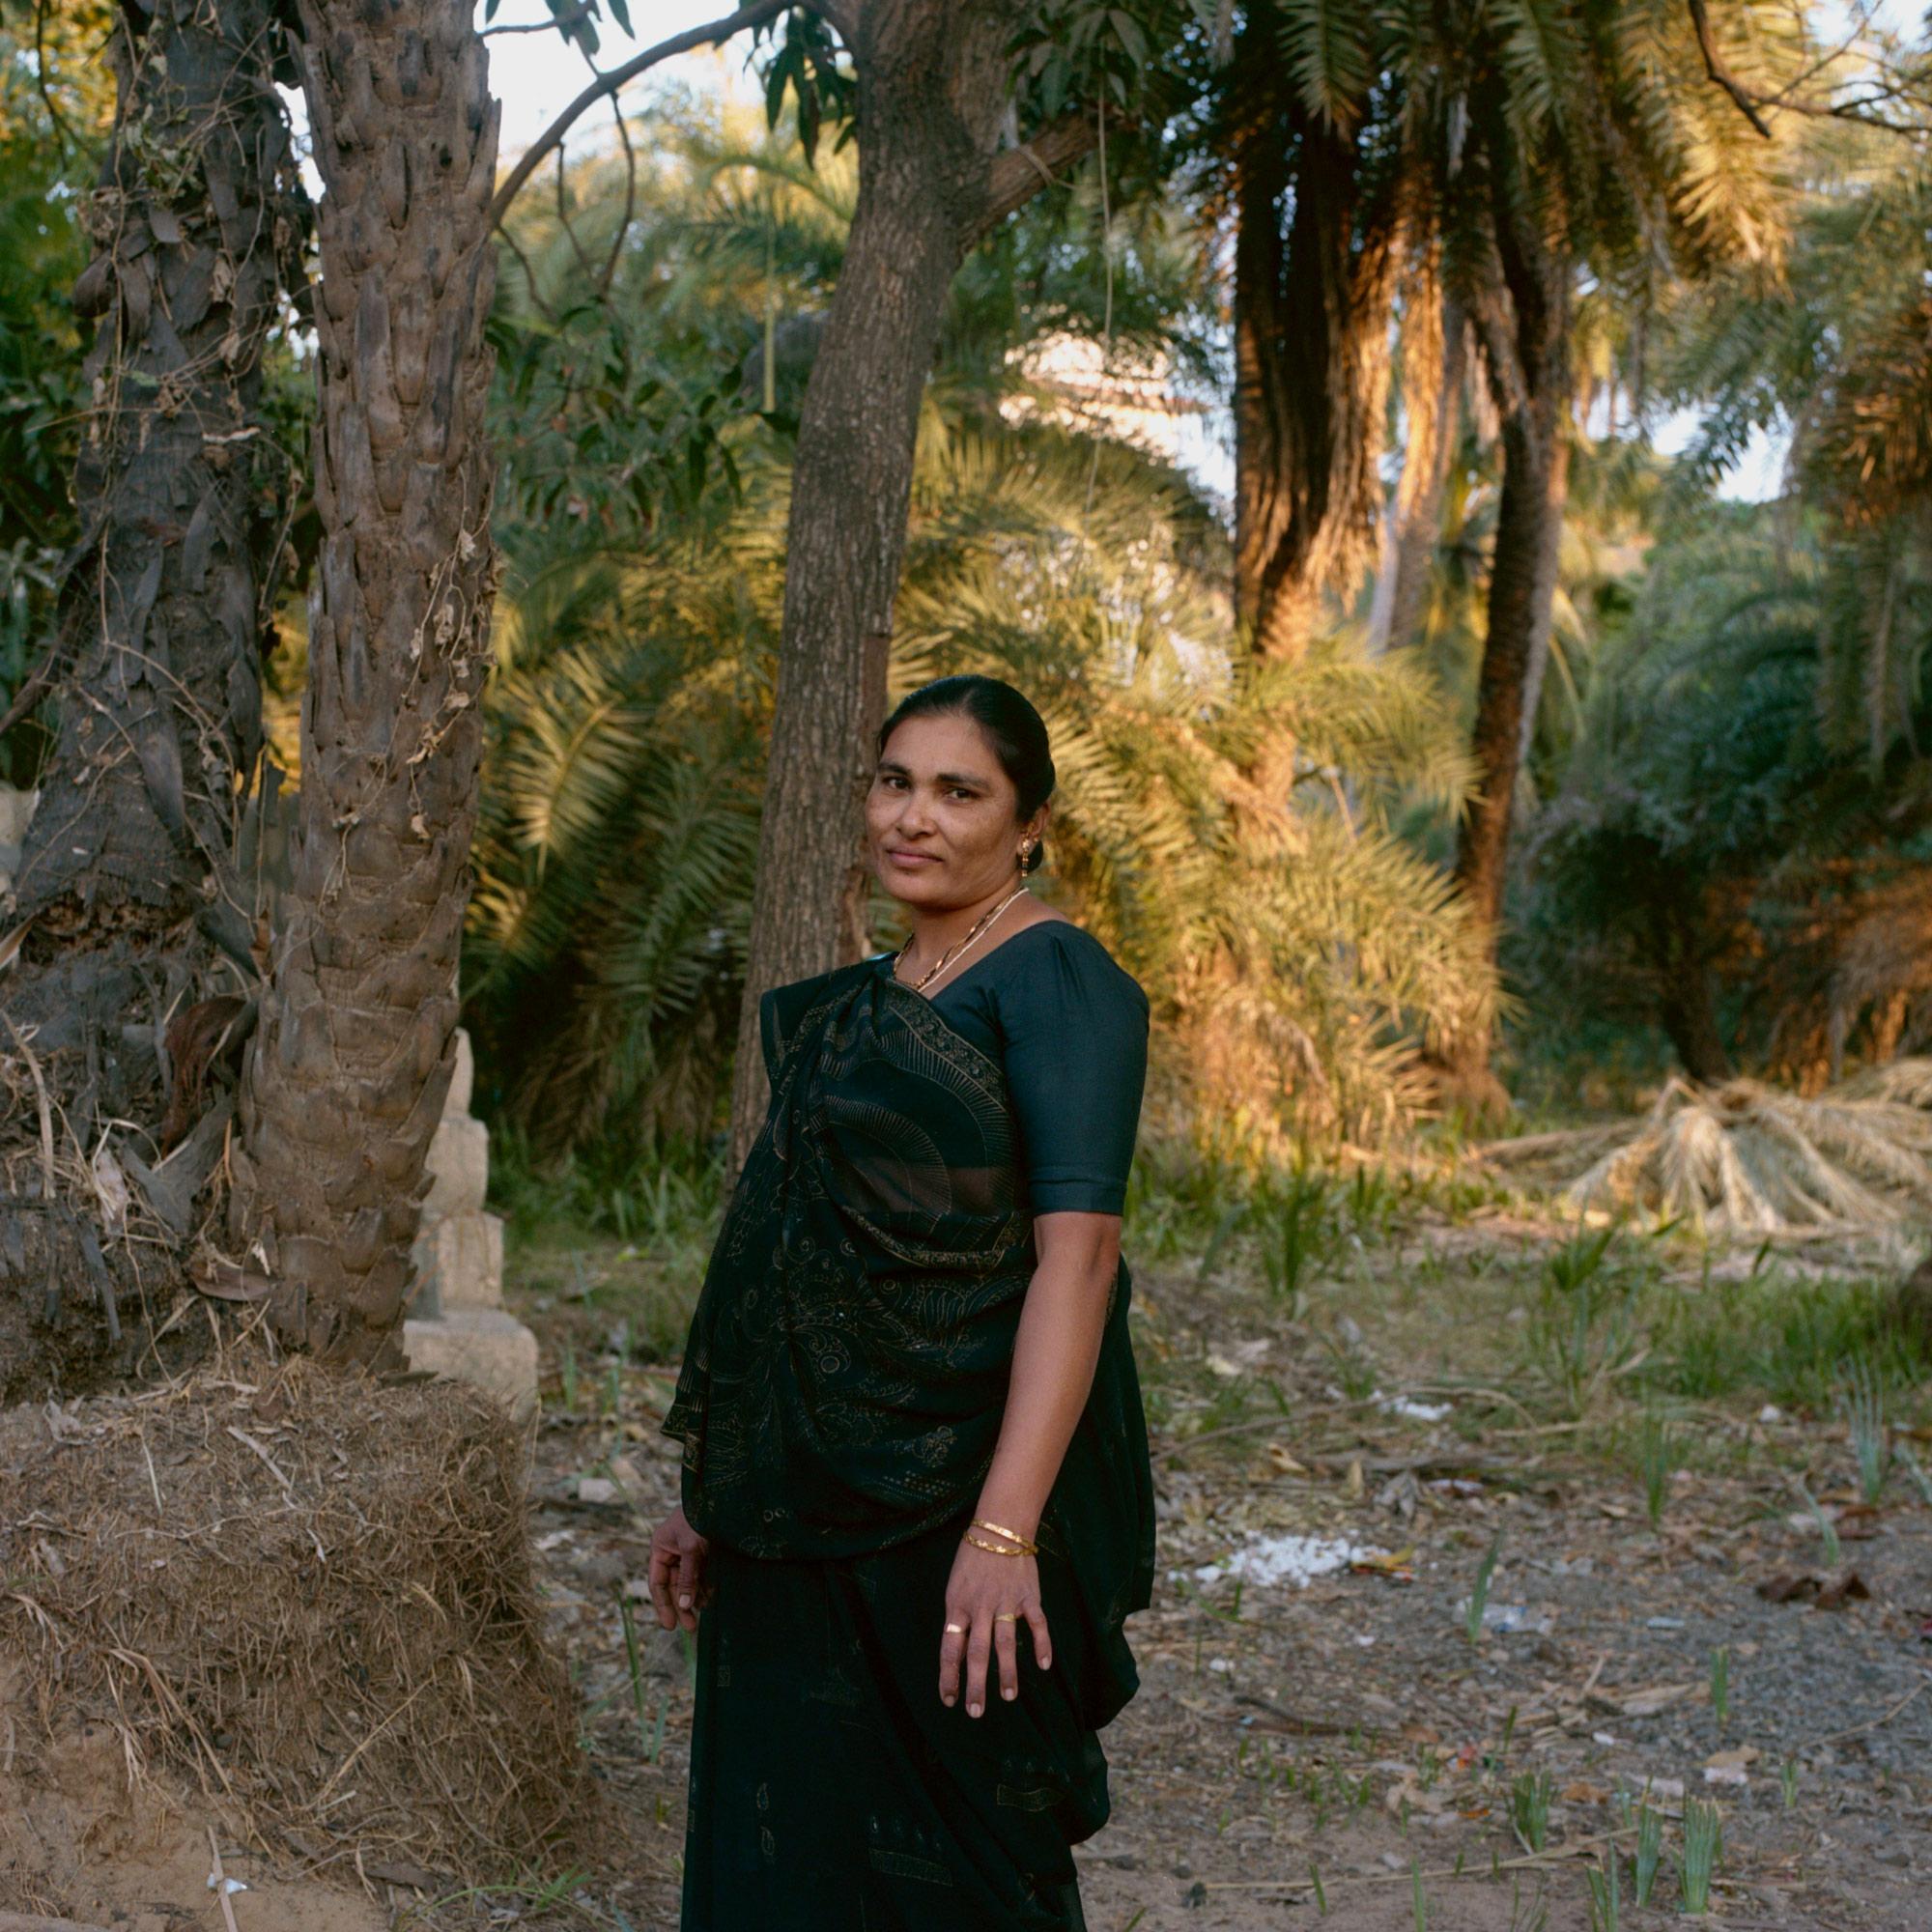 Woman in Diu India, portrait by Ioannis Koussertari 2010.